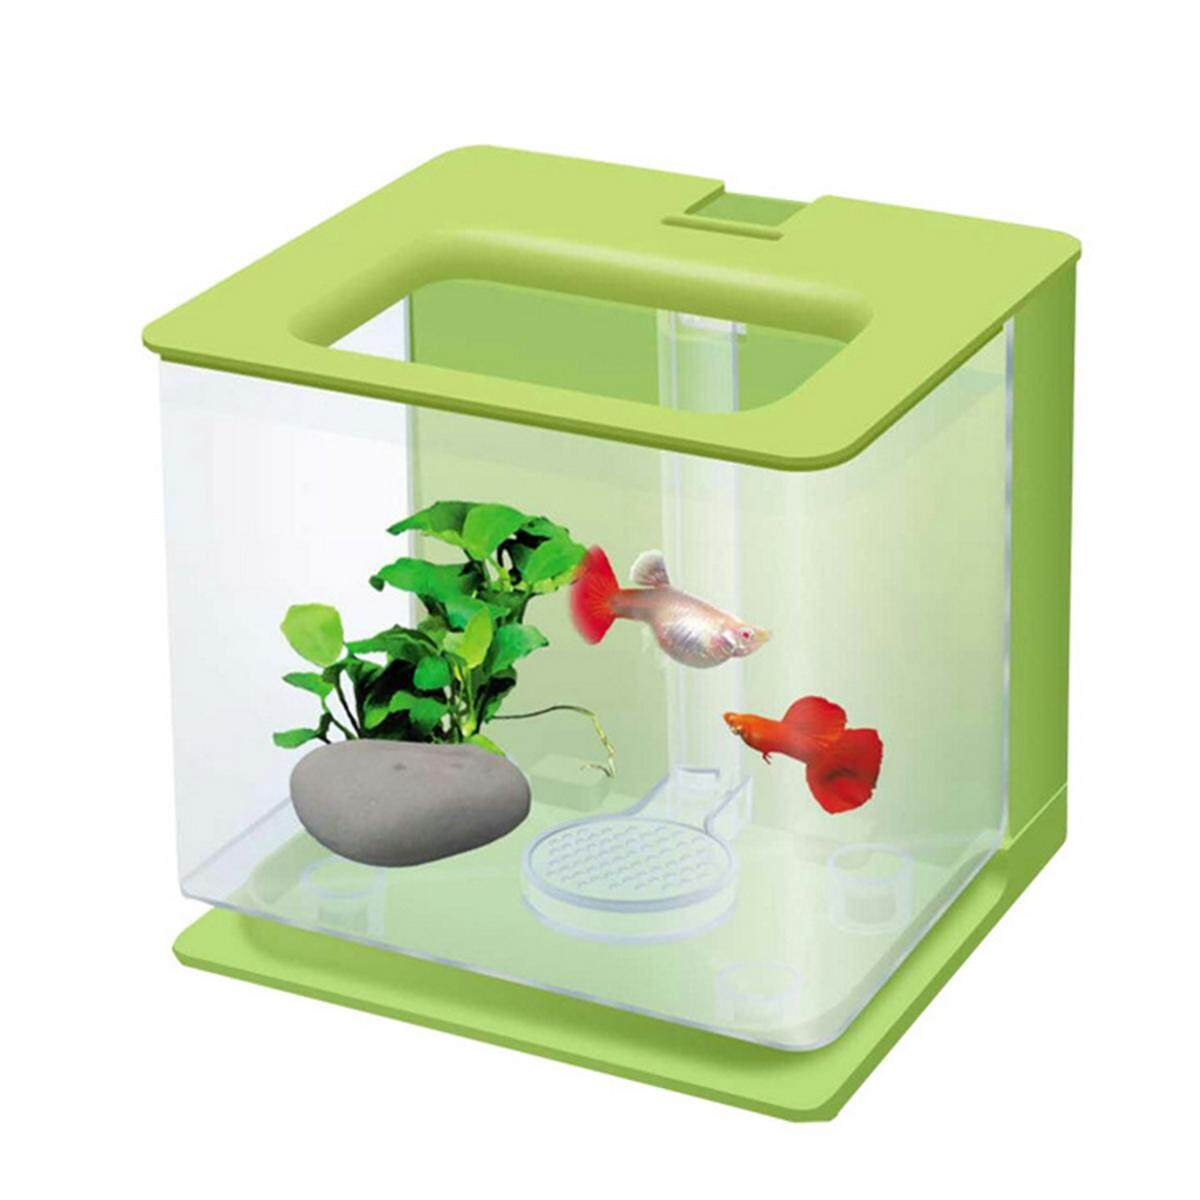 Acrylic Betta Clear Box Mini Desktop Office Aquarium Home Decoration Creative Fish Tank Self Clean Green By Moonbeam.